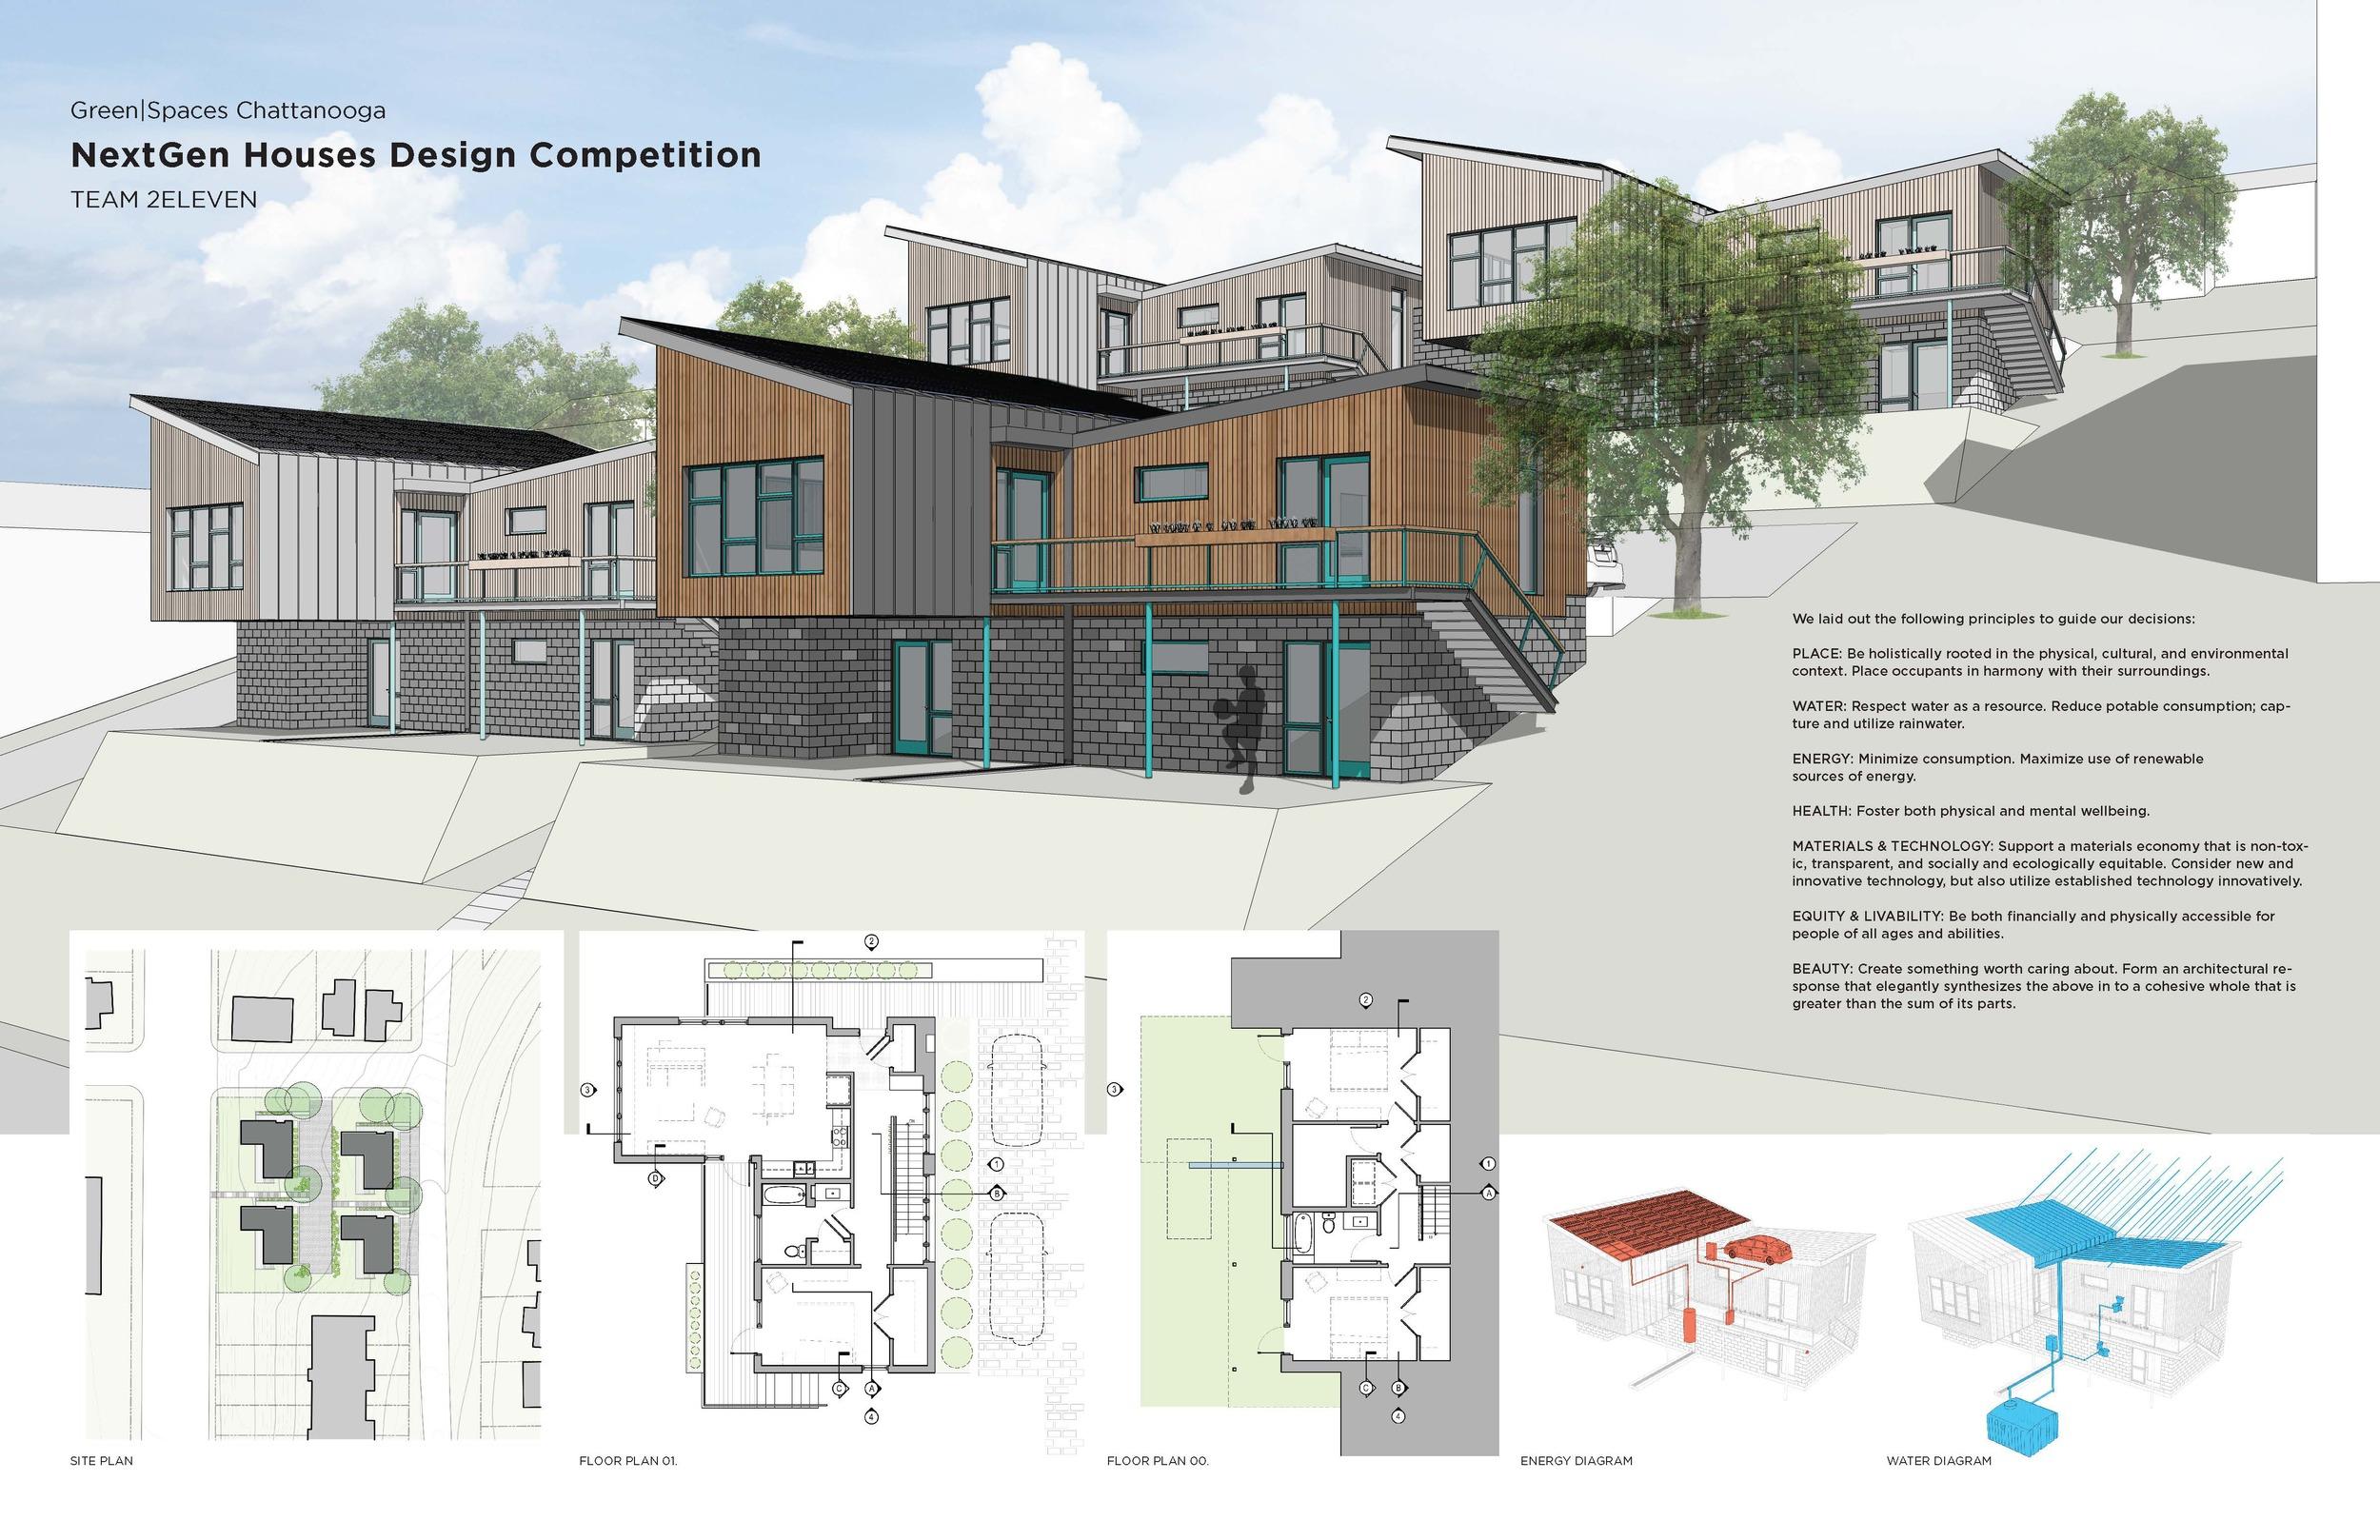 Elizabeth Eason Architecture: Elizabeth Eason; Facilites Systems Consultants: John Kenny; Collier Construction: Ethan Collier